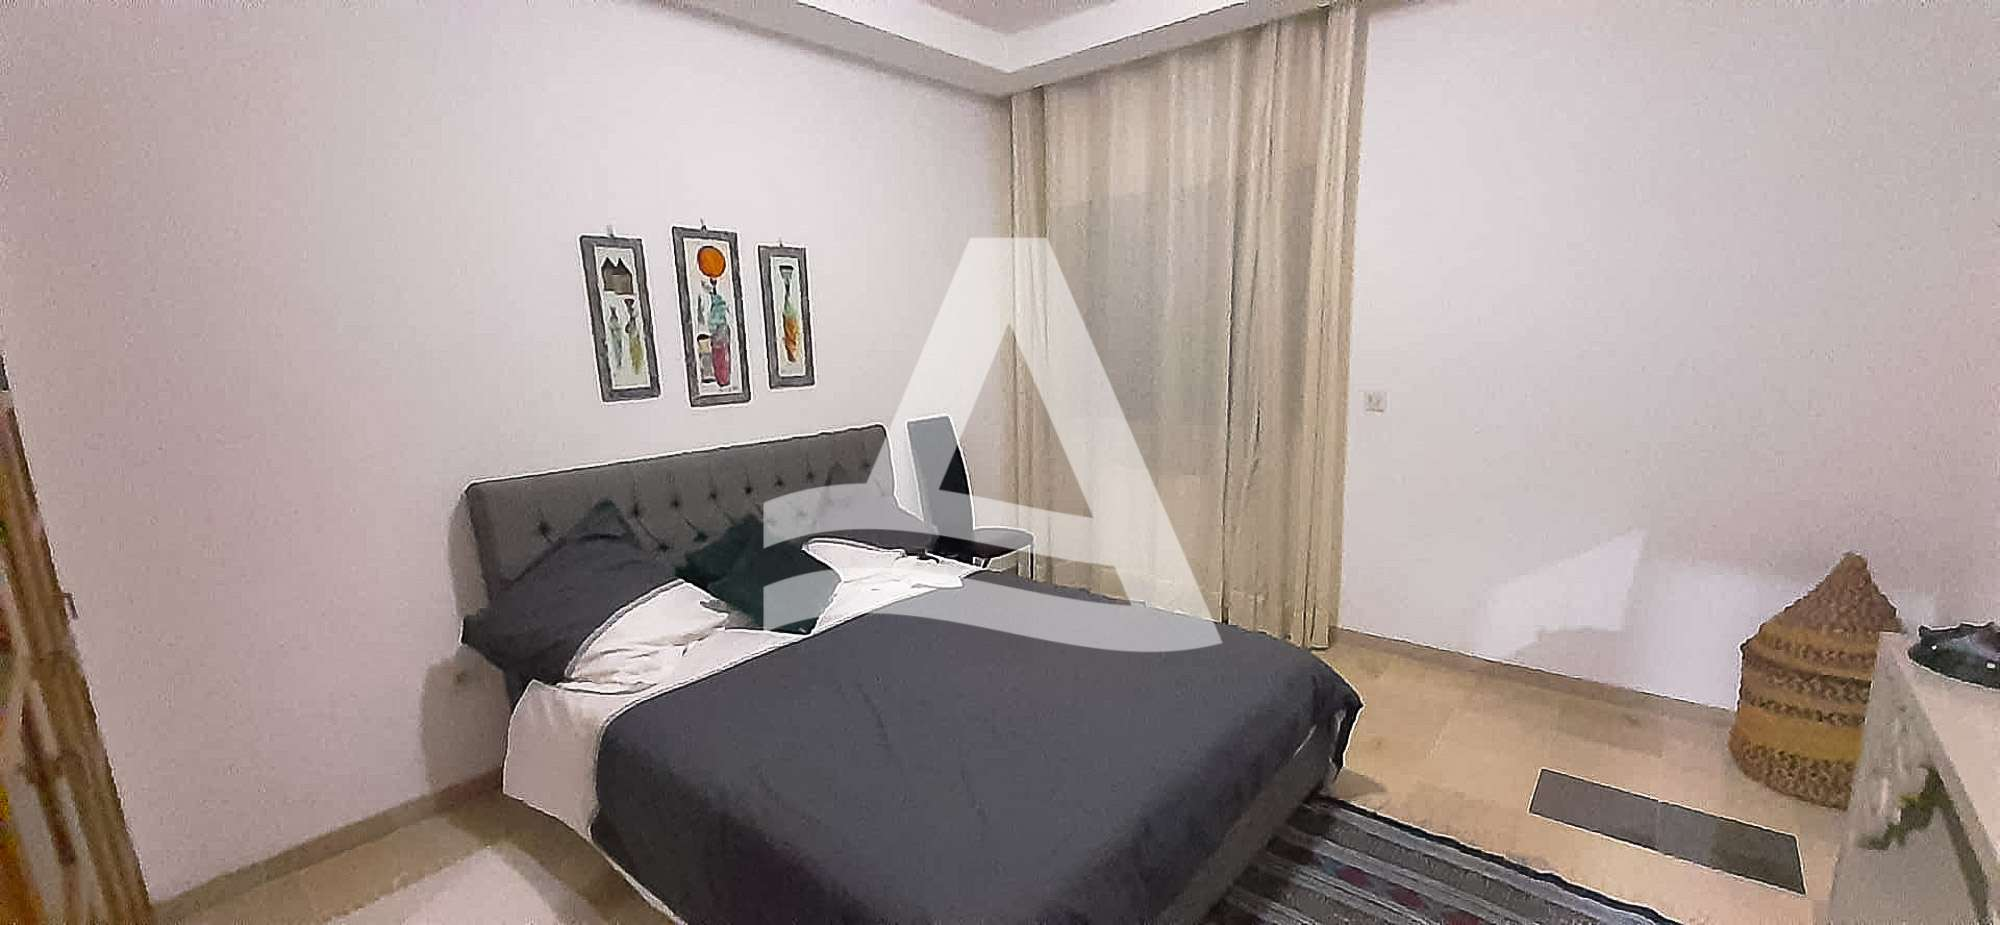 httpss3.amazonaws.comlogimoaws_Arcane_immobilière_la_Marsa-_location_-_vente_la_marsa_2_sur_12_1574867274125